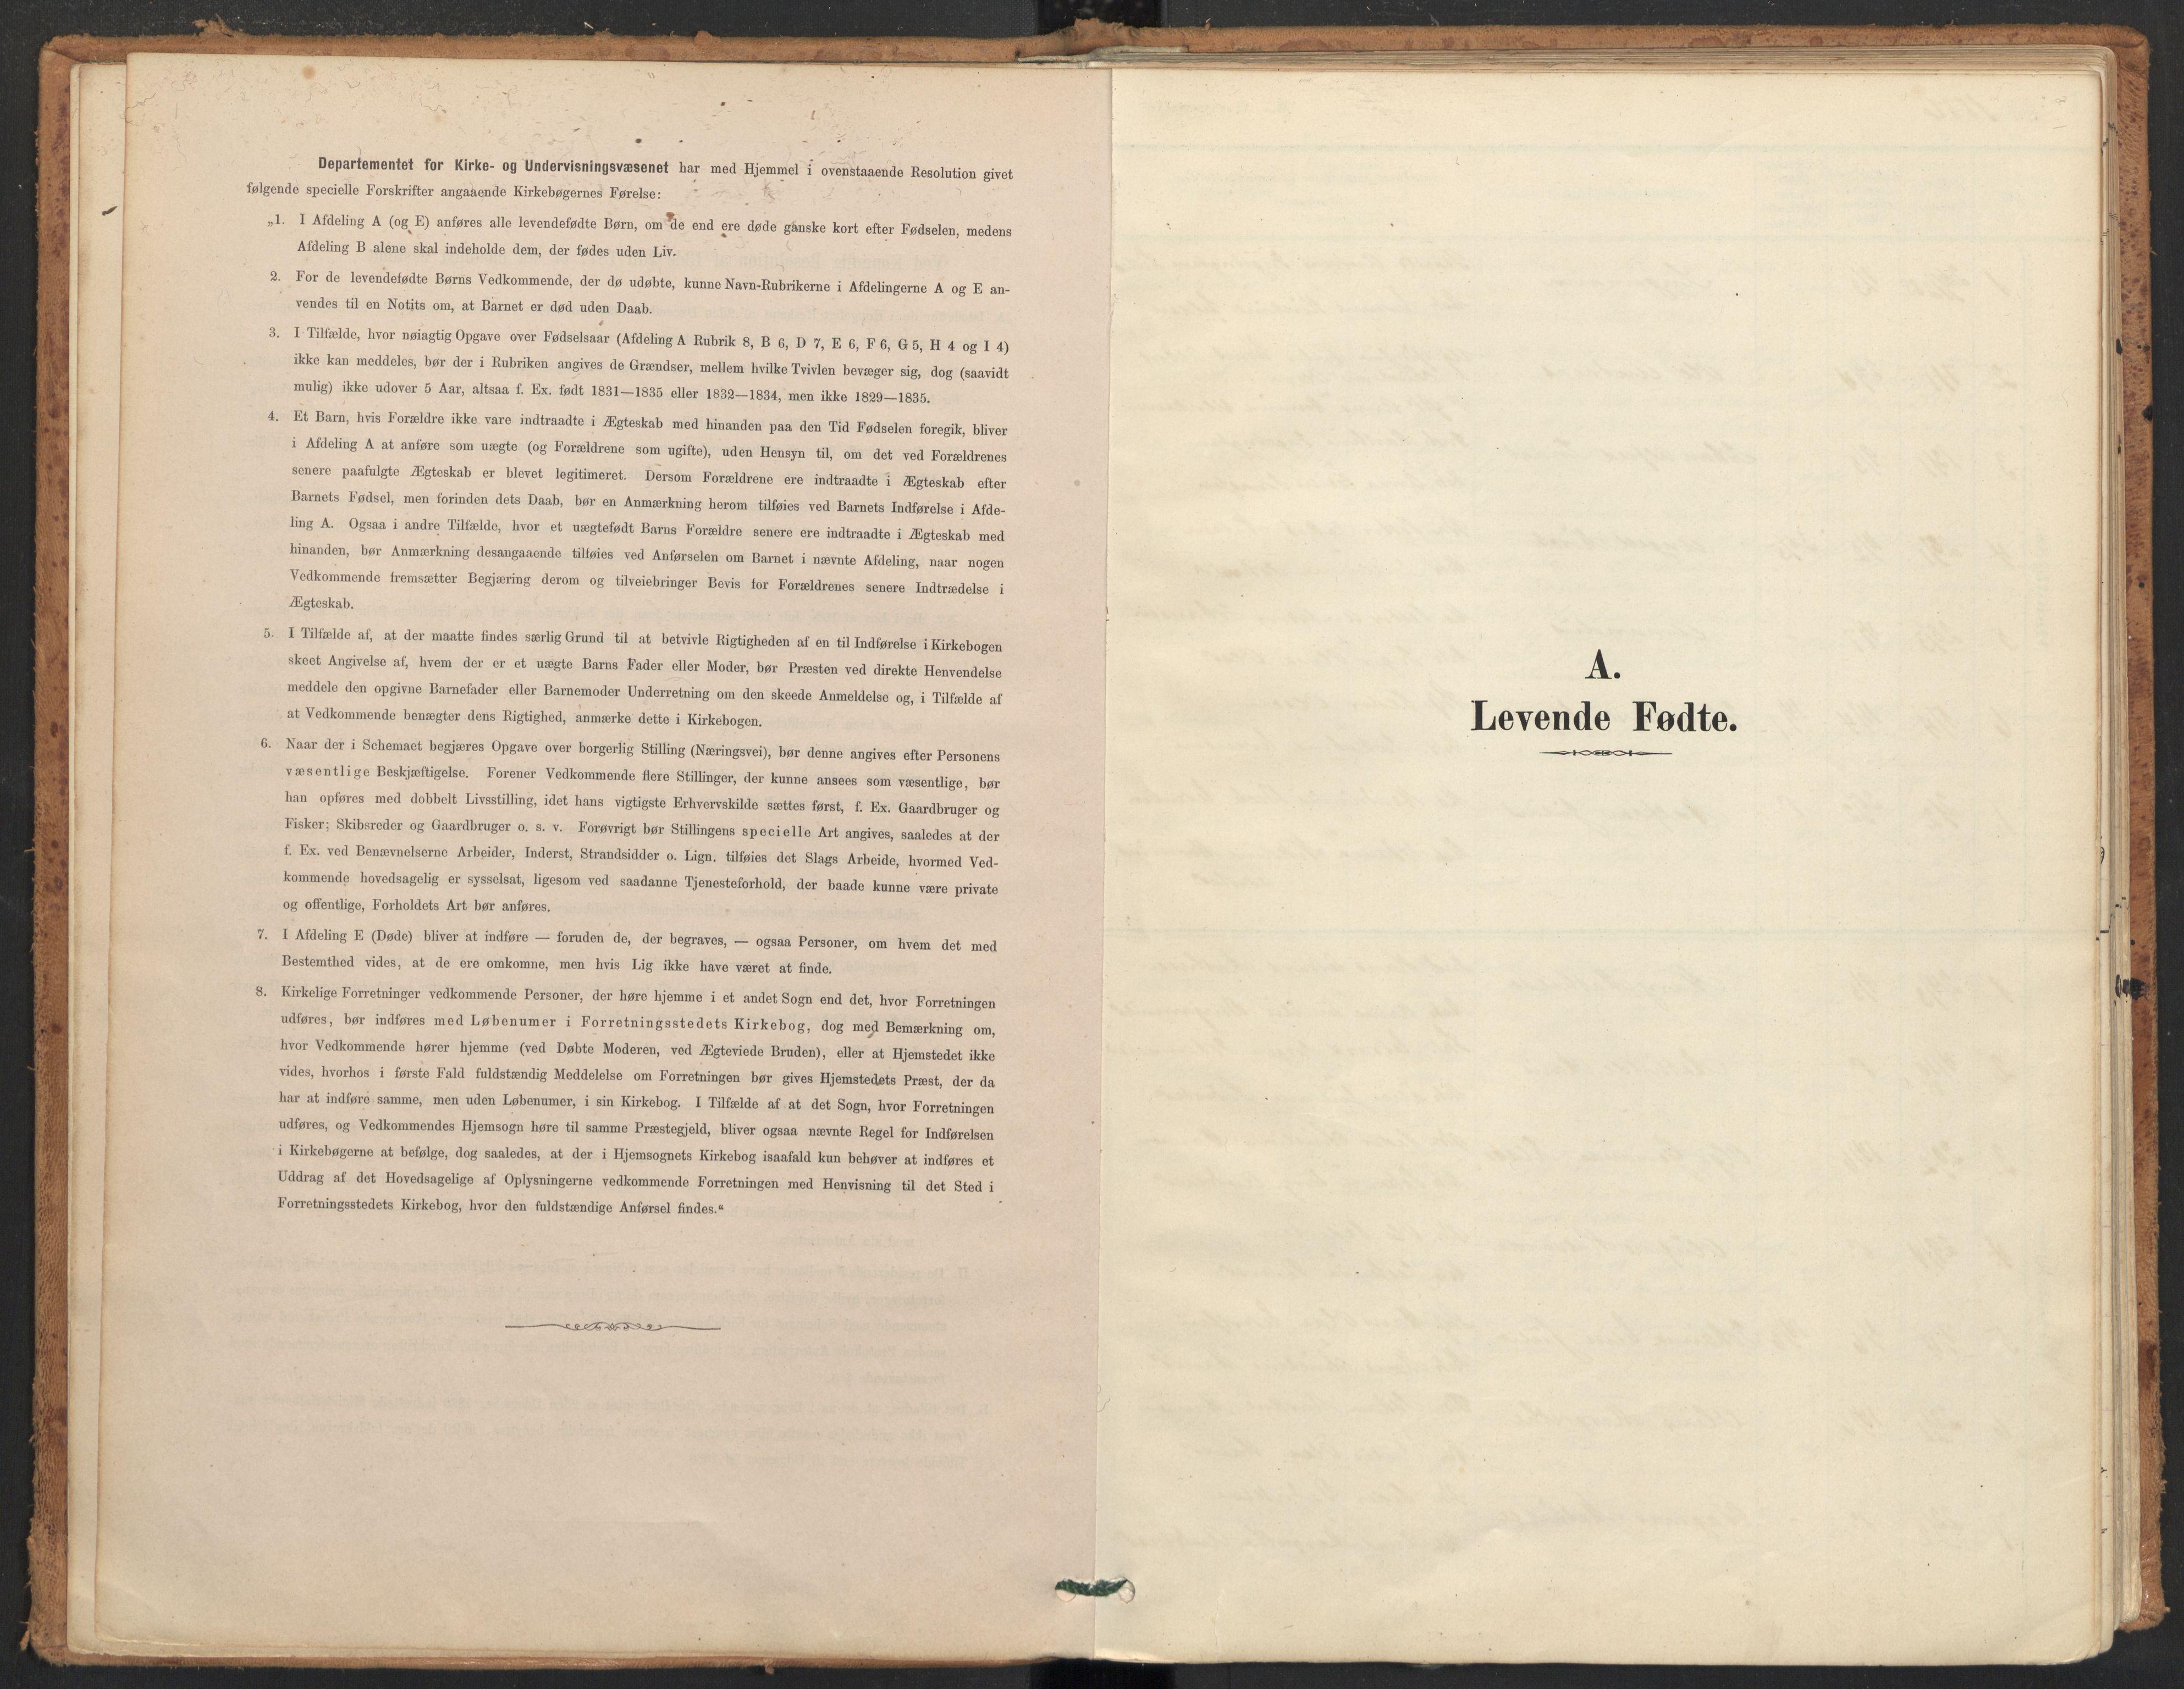 SAT, Ministerialprotokoller, klokkerbøker og fødselsregistre - Nordland, 830/L0453: Ministerialbok nr. 830A17, 1886-1911